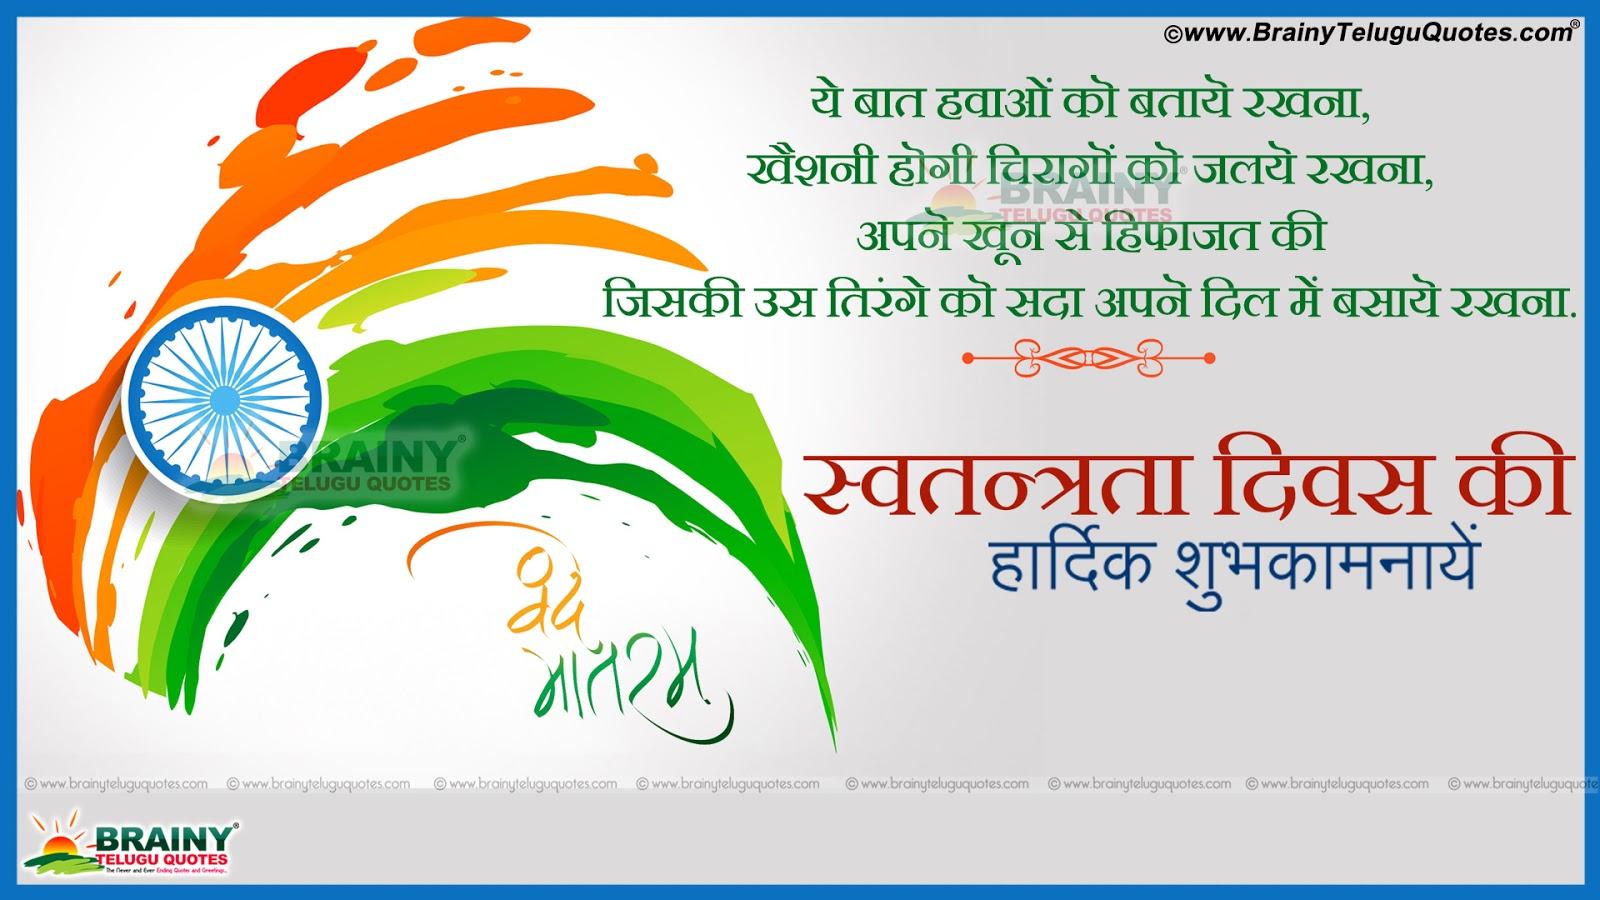 Independence day in hindi language